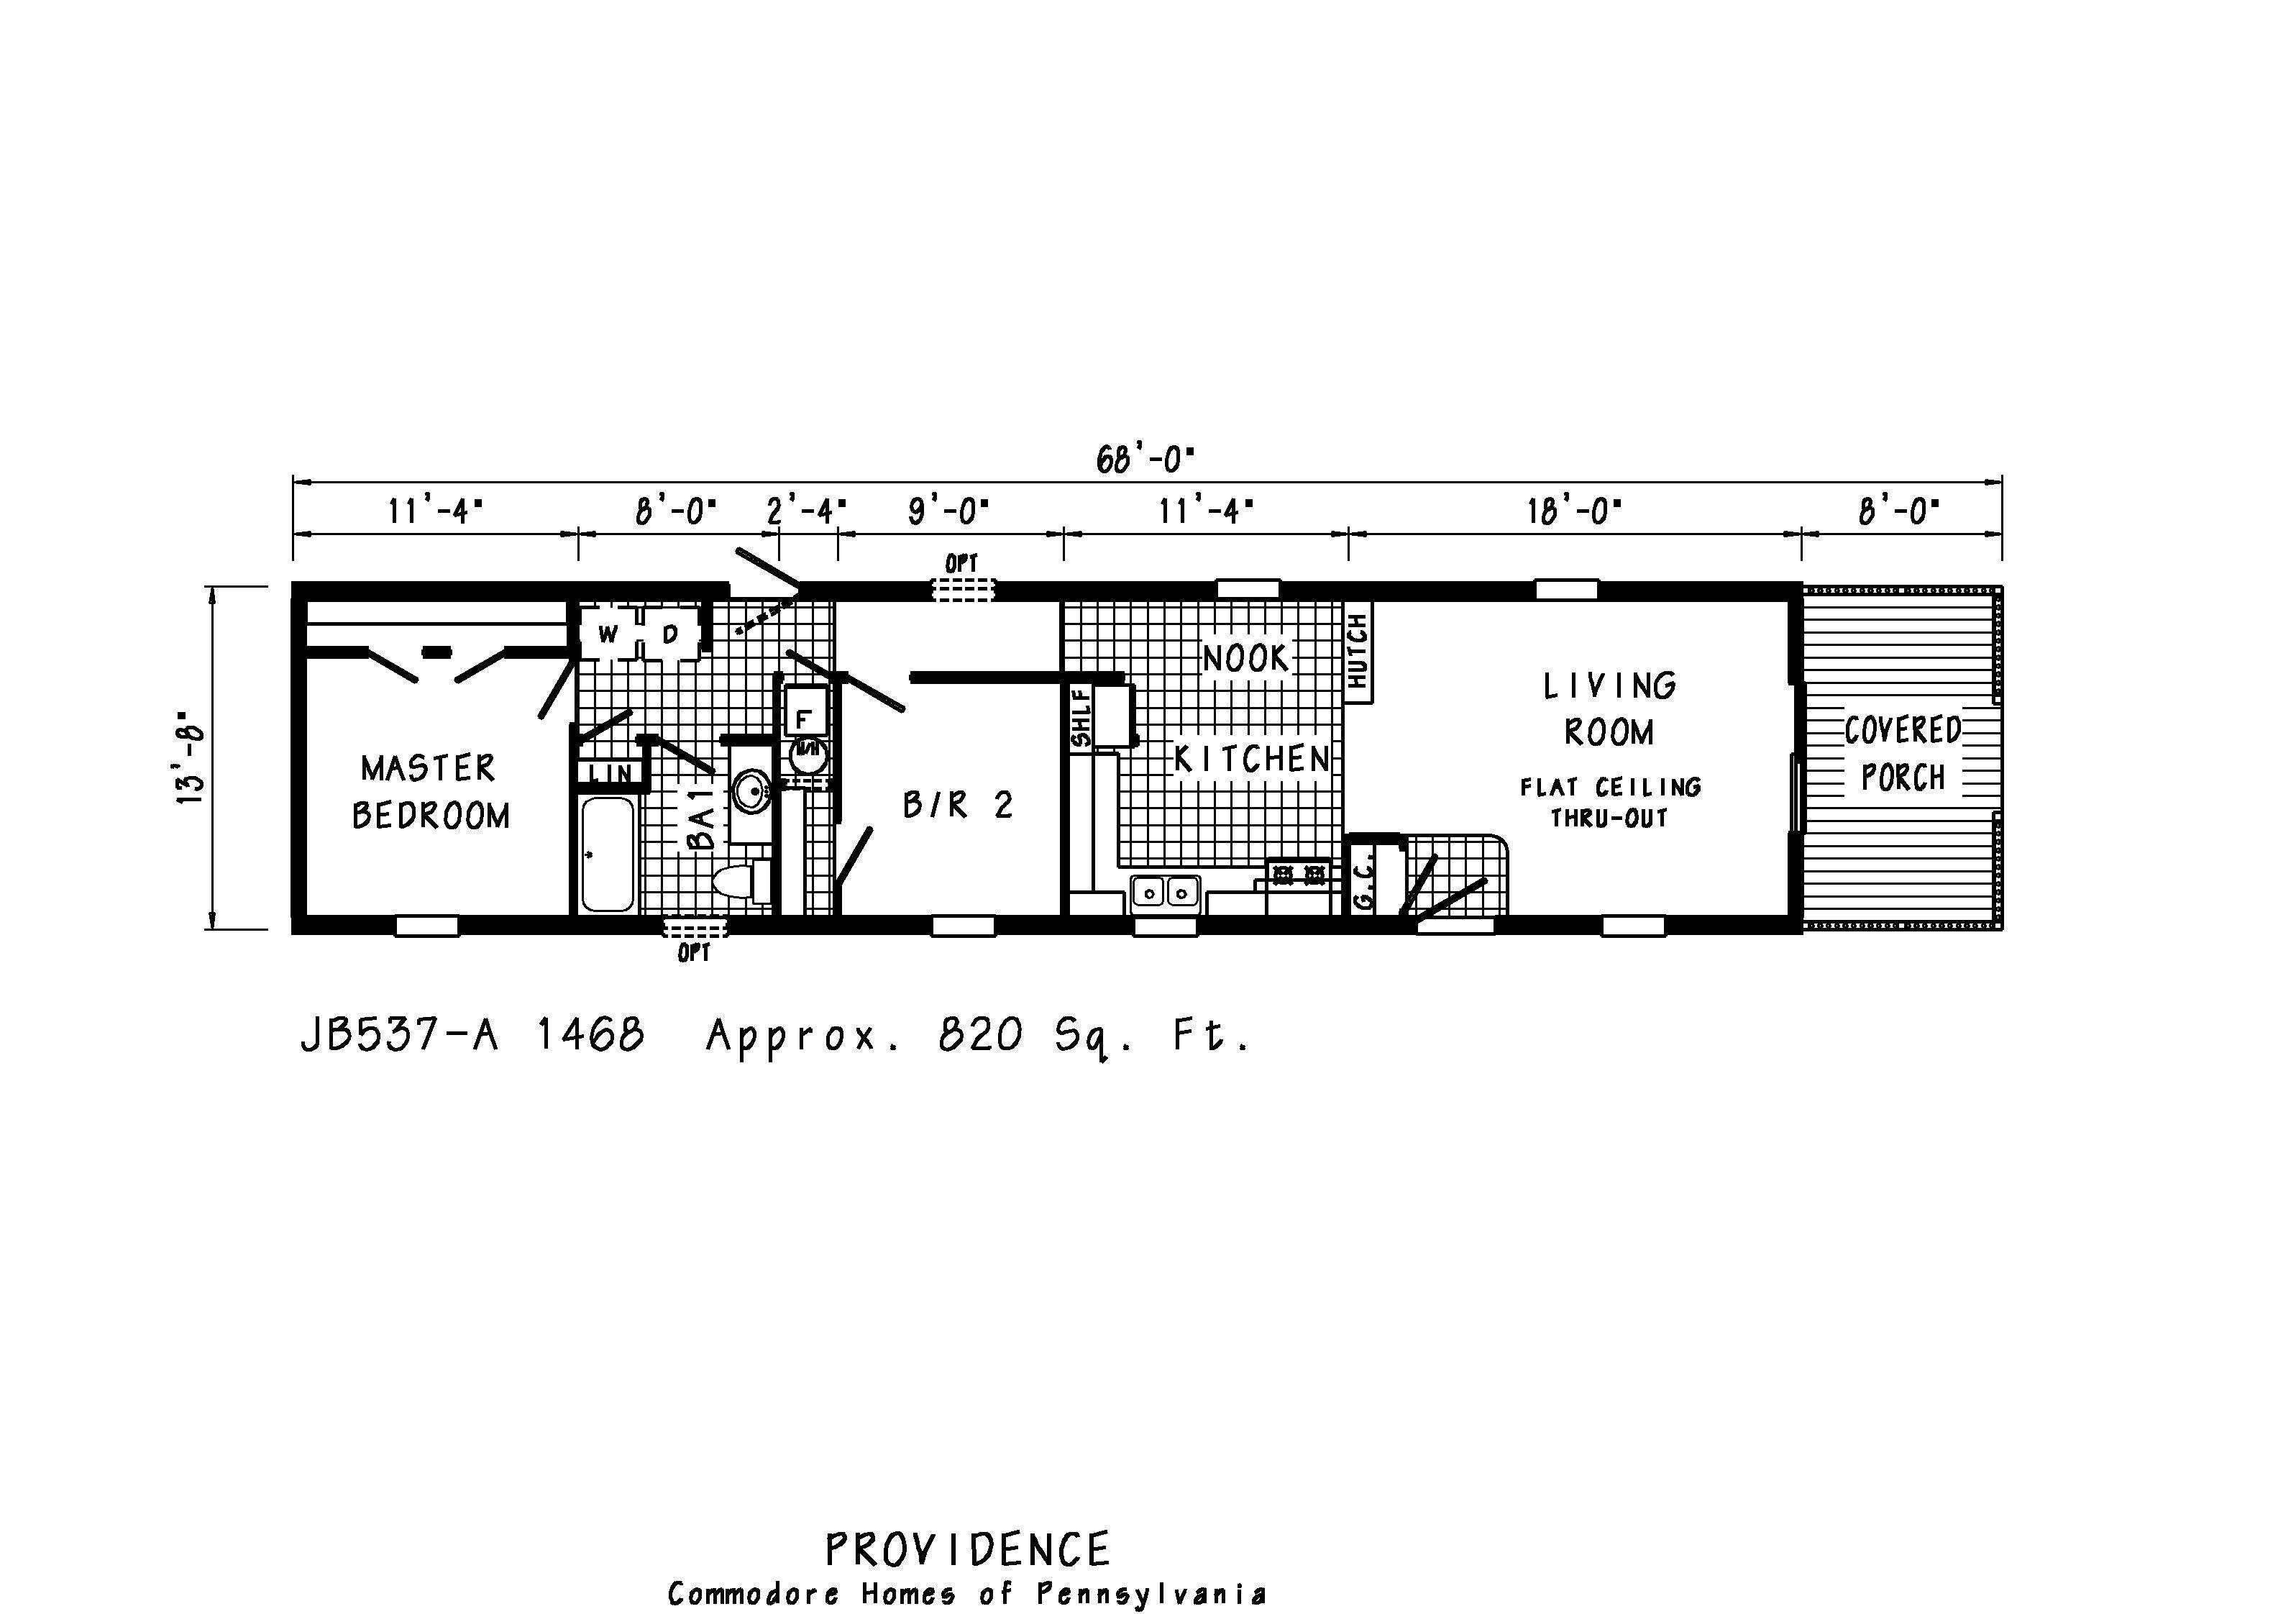 mobile home catalog floor plans new manufactured homes kaf mobile home catalog floor plans new manufactured homes